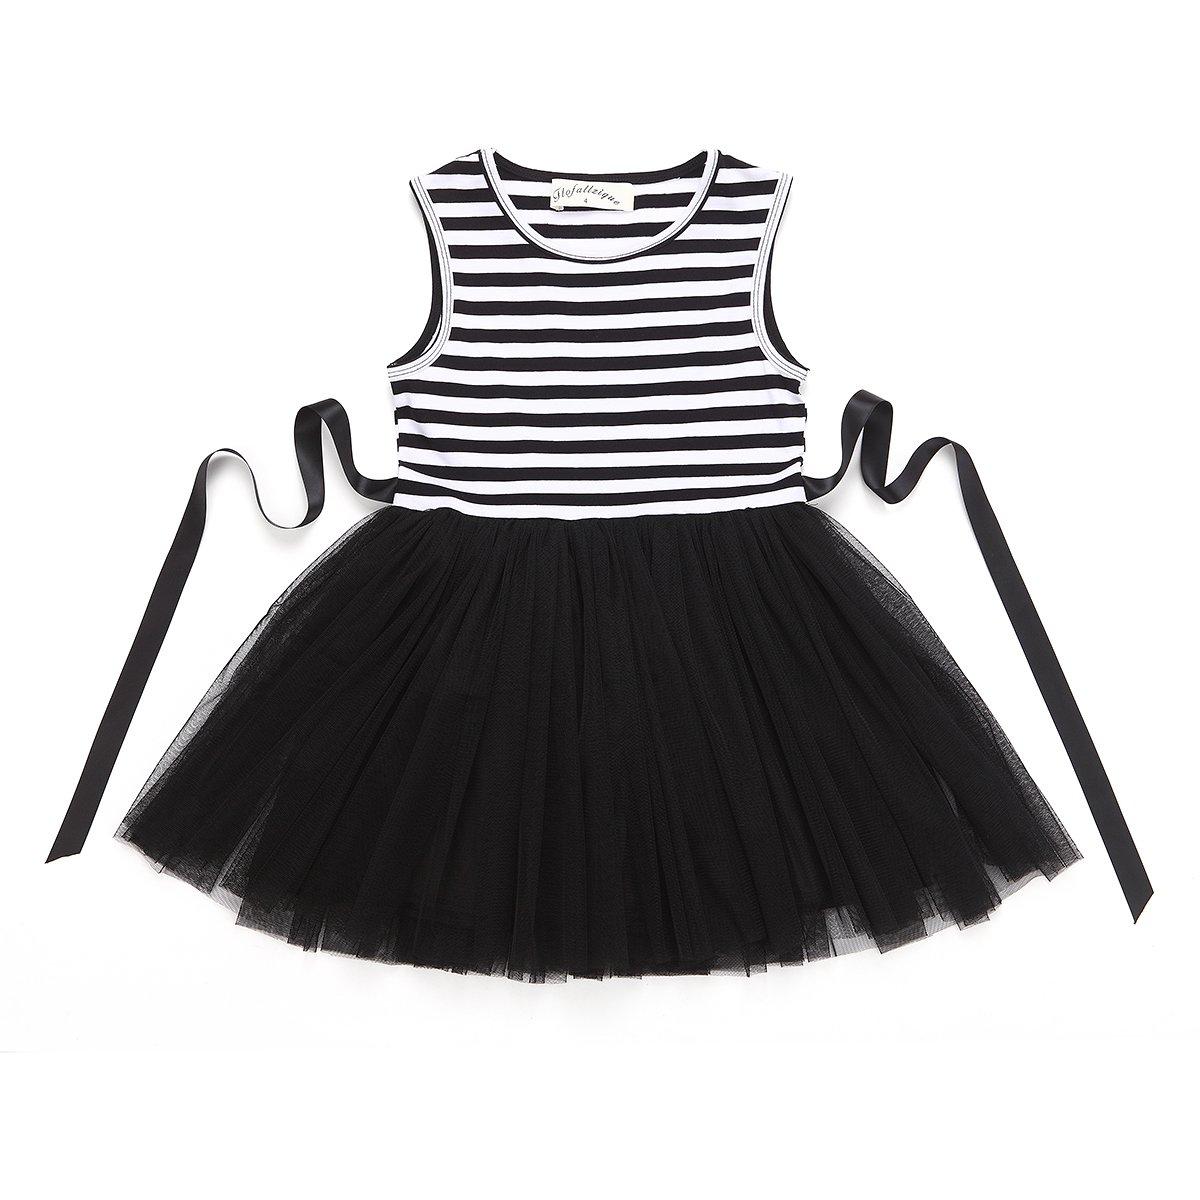 Flofallzique Toddler Girl Dress Striped Tulle Tutu Baby Party Dress Summer Dress for Kids(7, Black)